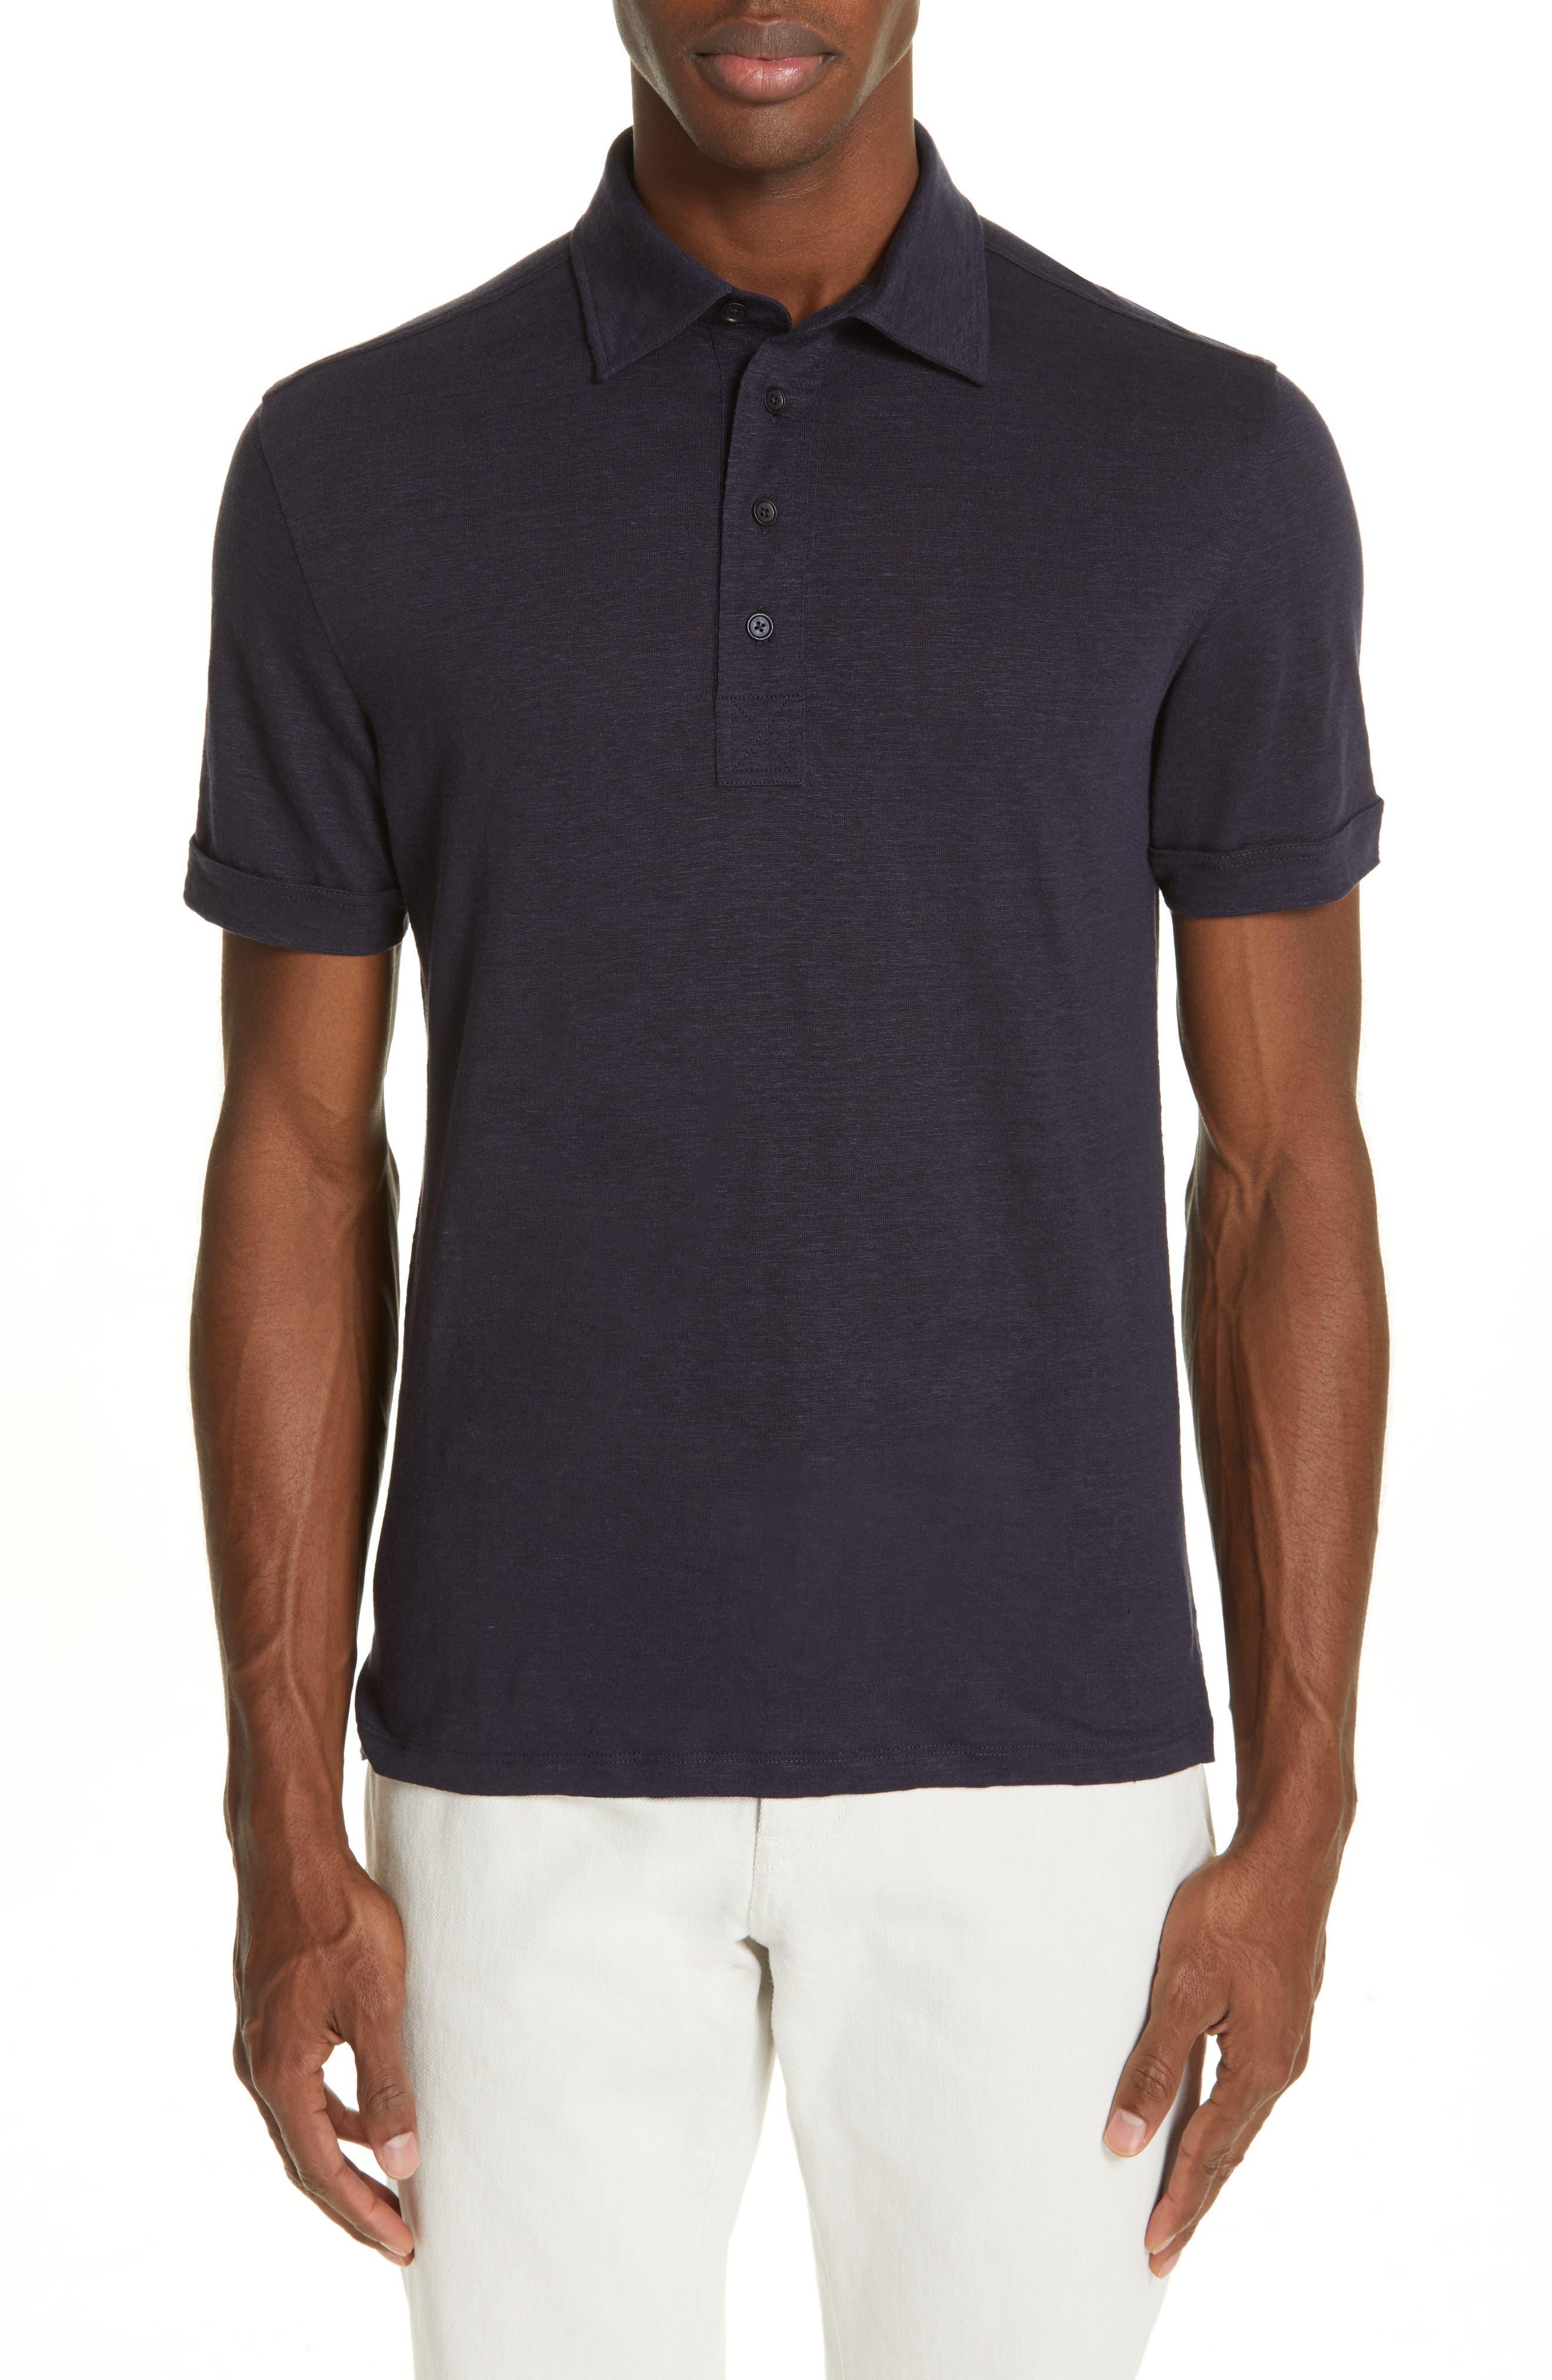 ERMENEGILDO ZEGNA Ermenegilda Zegna Linen Polo Shirt, Main, color, NAVY